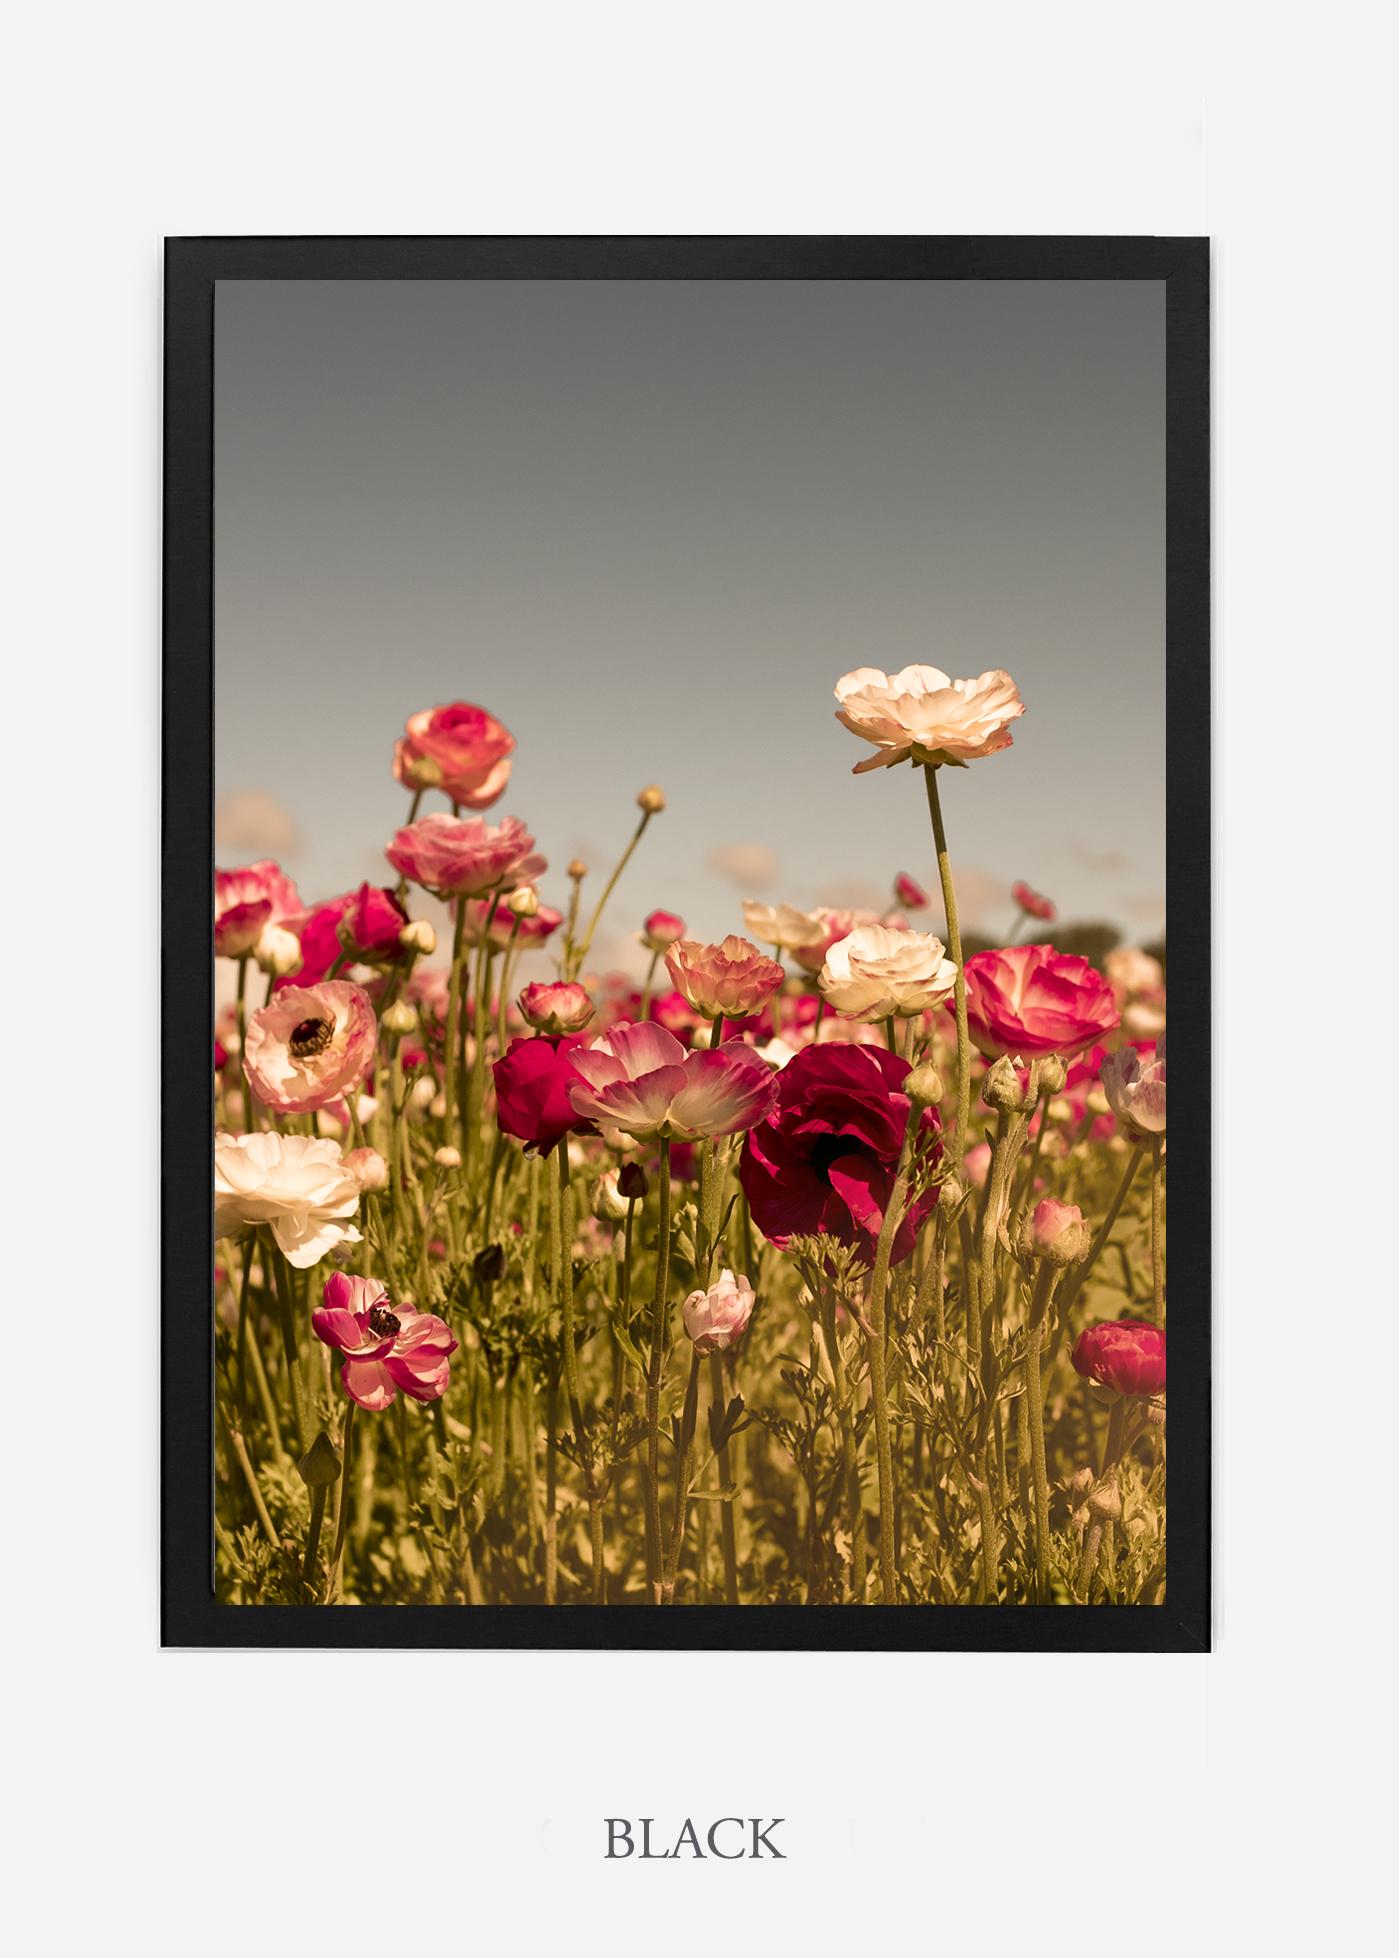 wilder-california-Floral-No.3-black-frame-no-mat-interior-design-botanical-print-art-floral-art.jpg